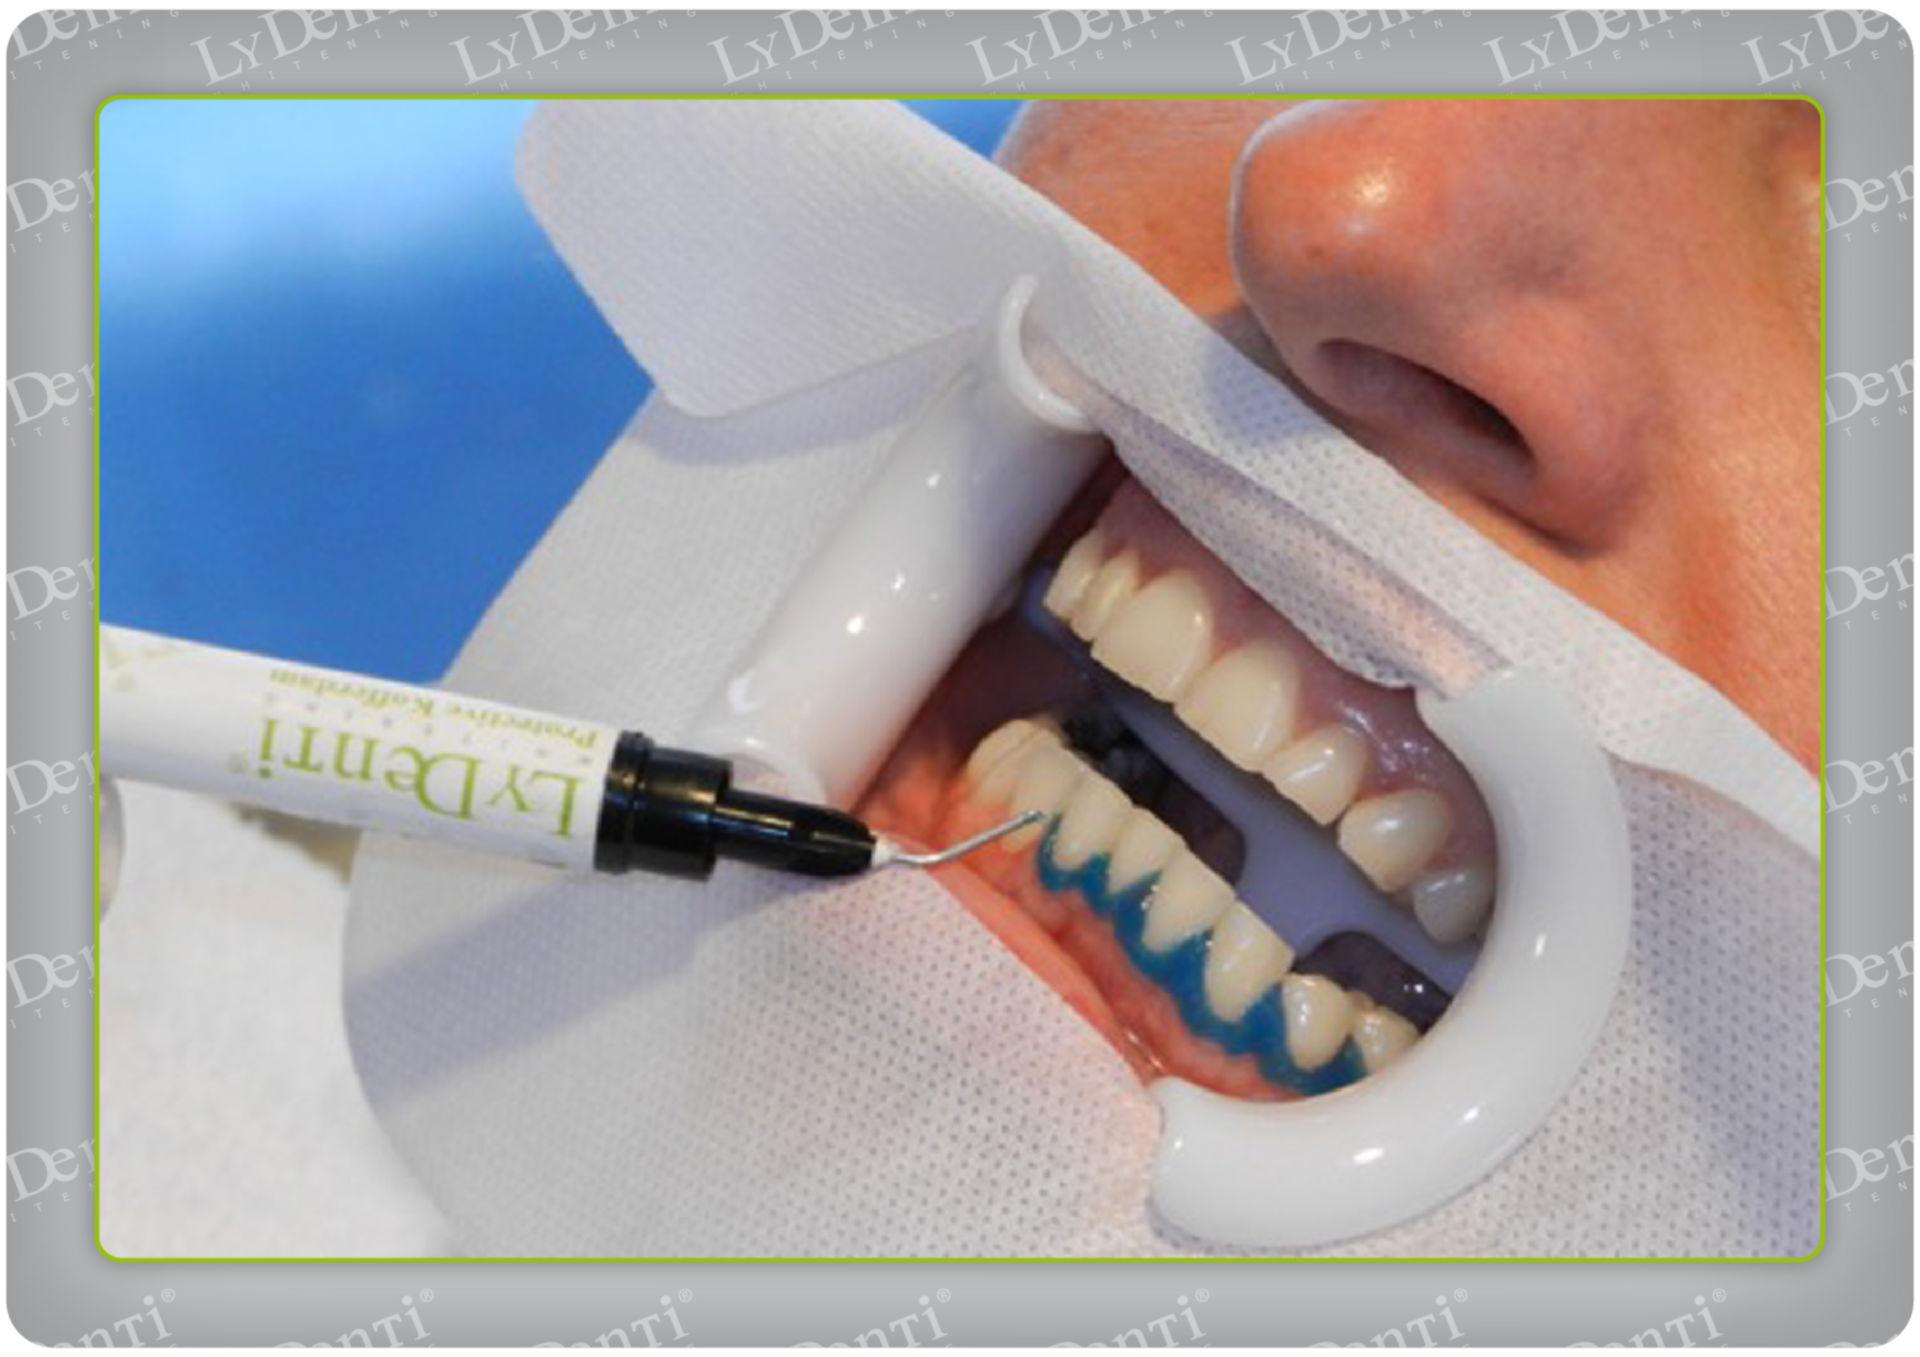 Blanqueamiento dental (10)